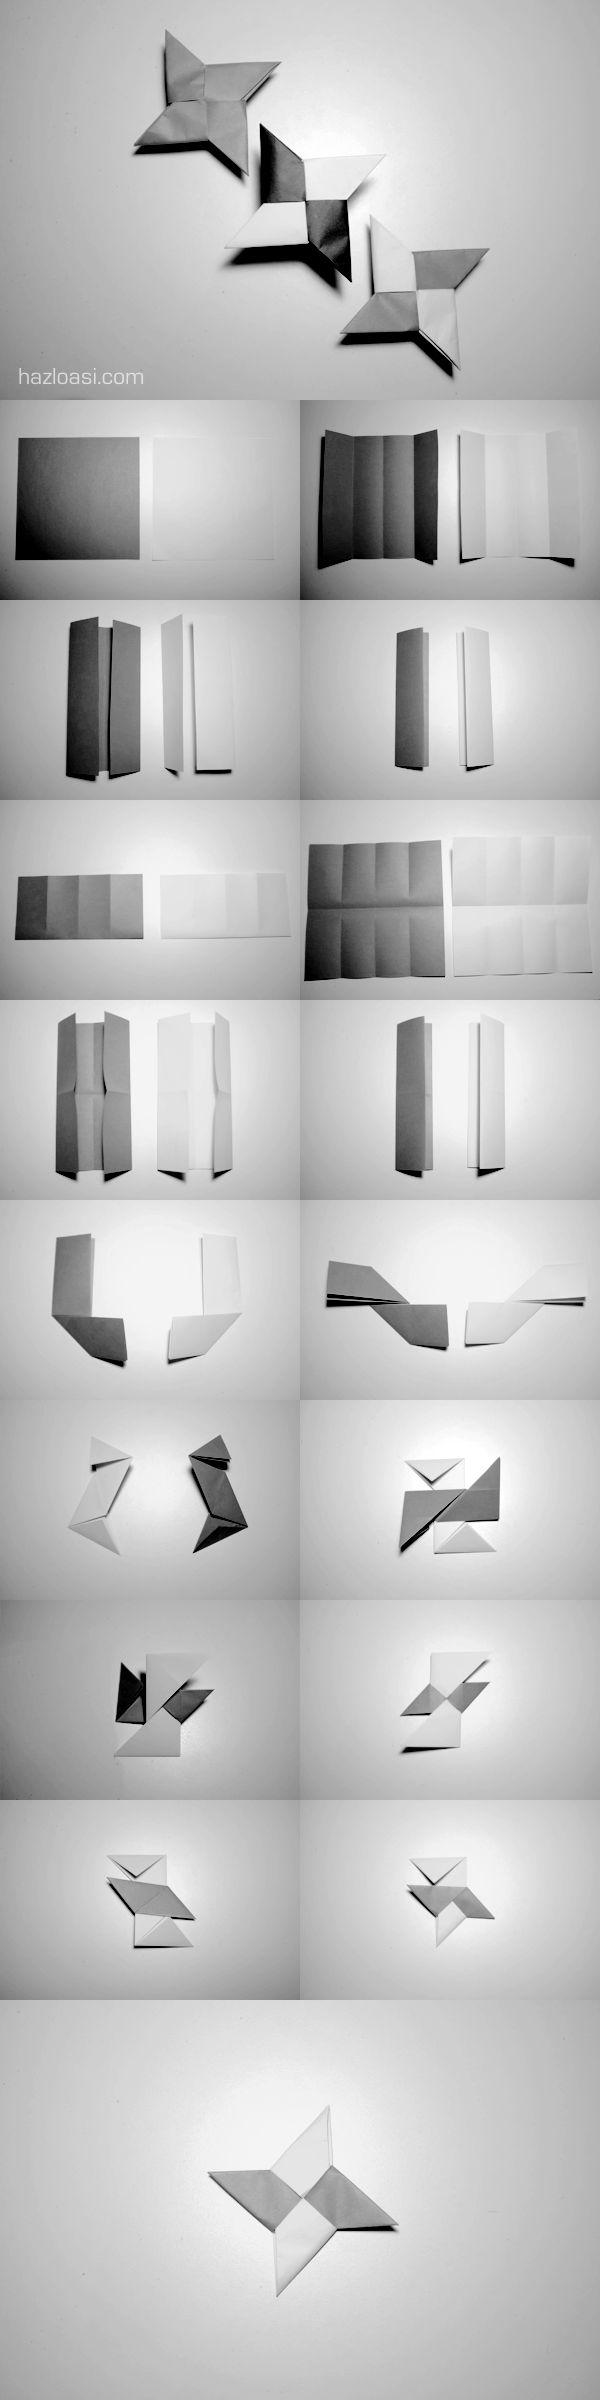 Origami. How to make a paper star, Ninja Shuriken. https://www.youtube.com/watch?v=dYgsmA_yC58